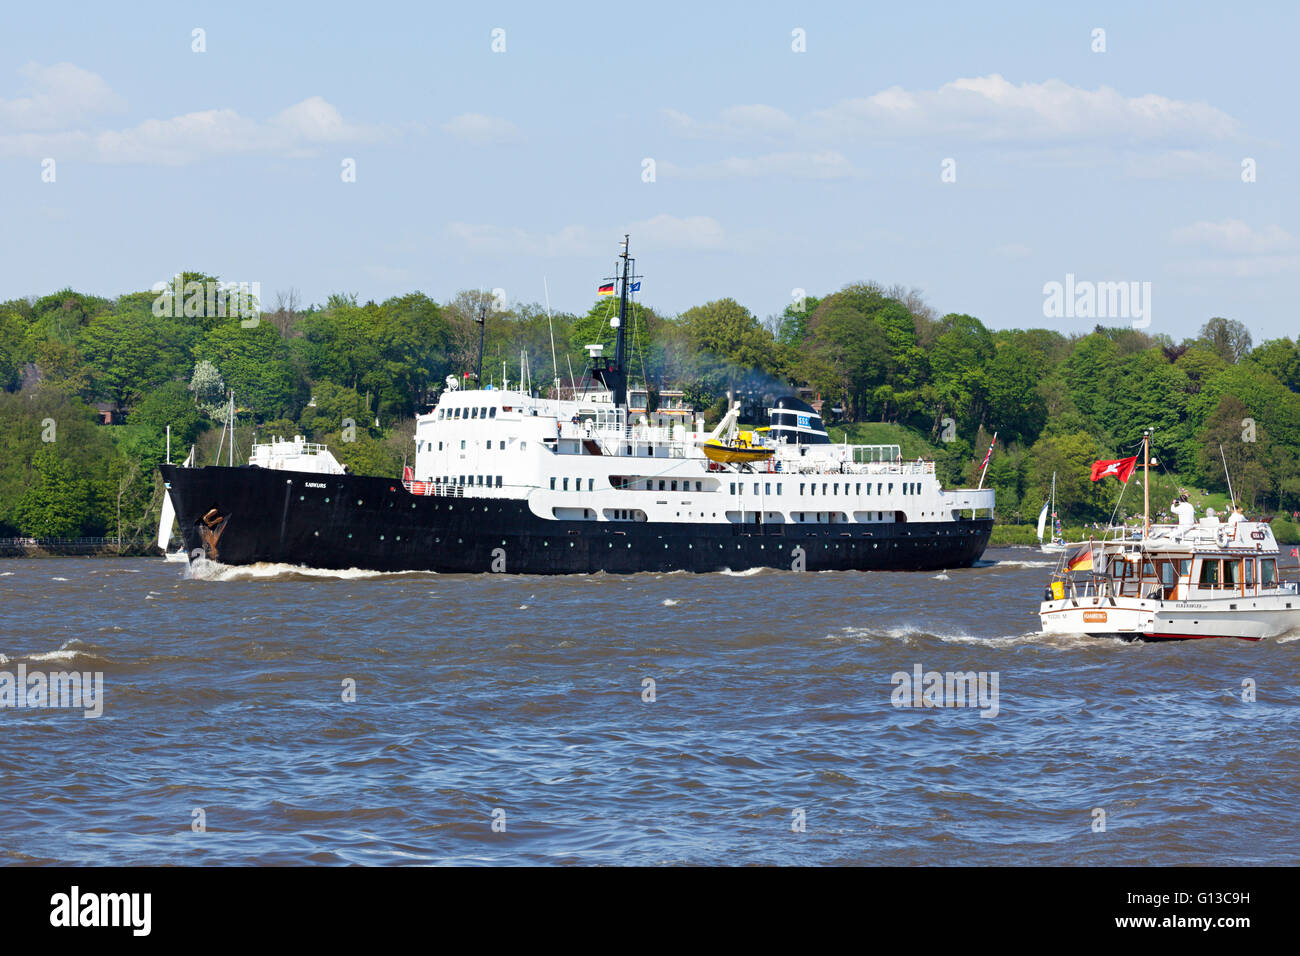 Norwegian historic training ship SJØKURS on the Elbe river during 827th Port Anniversary, Hamburg, Germany - Stock Image